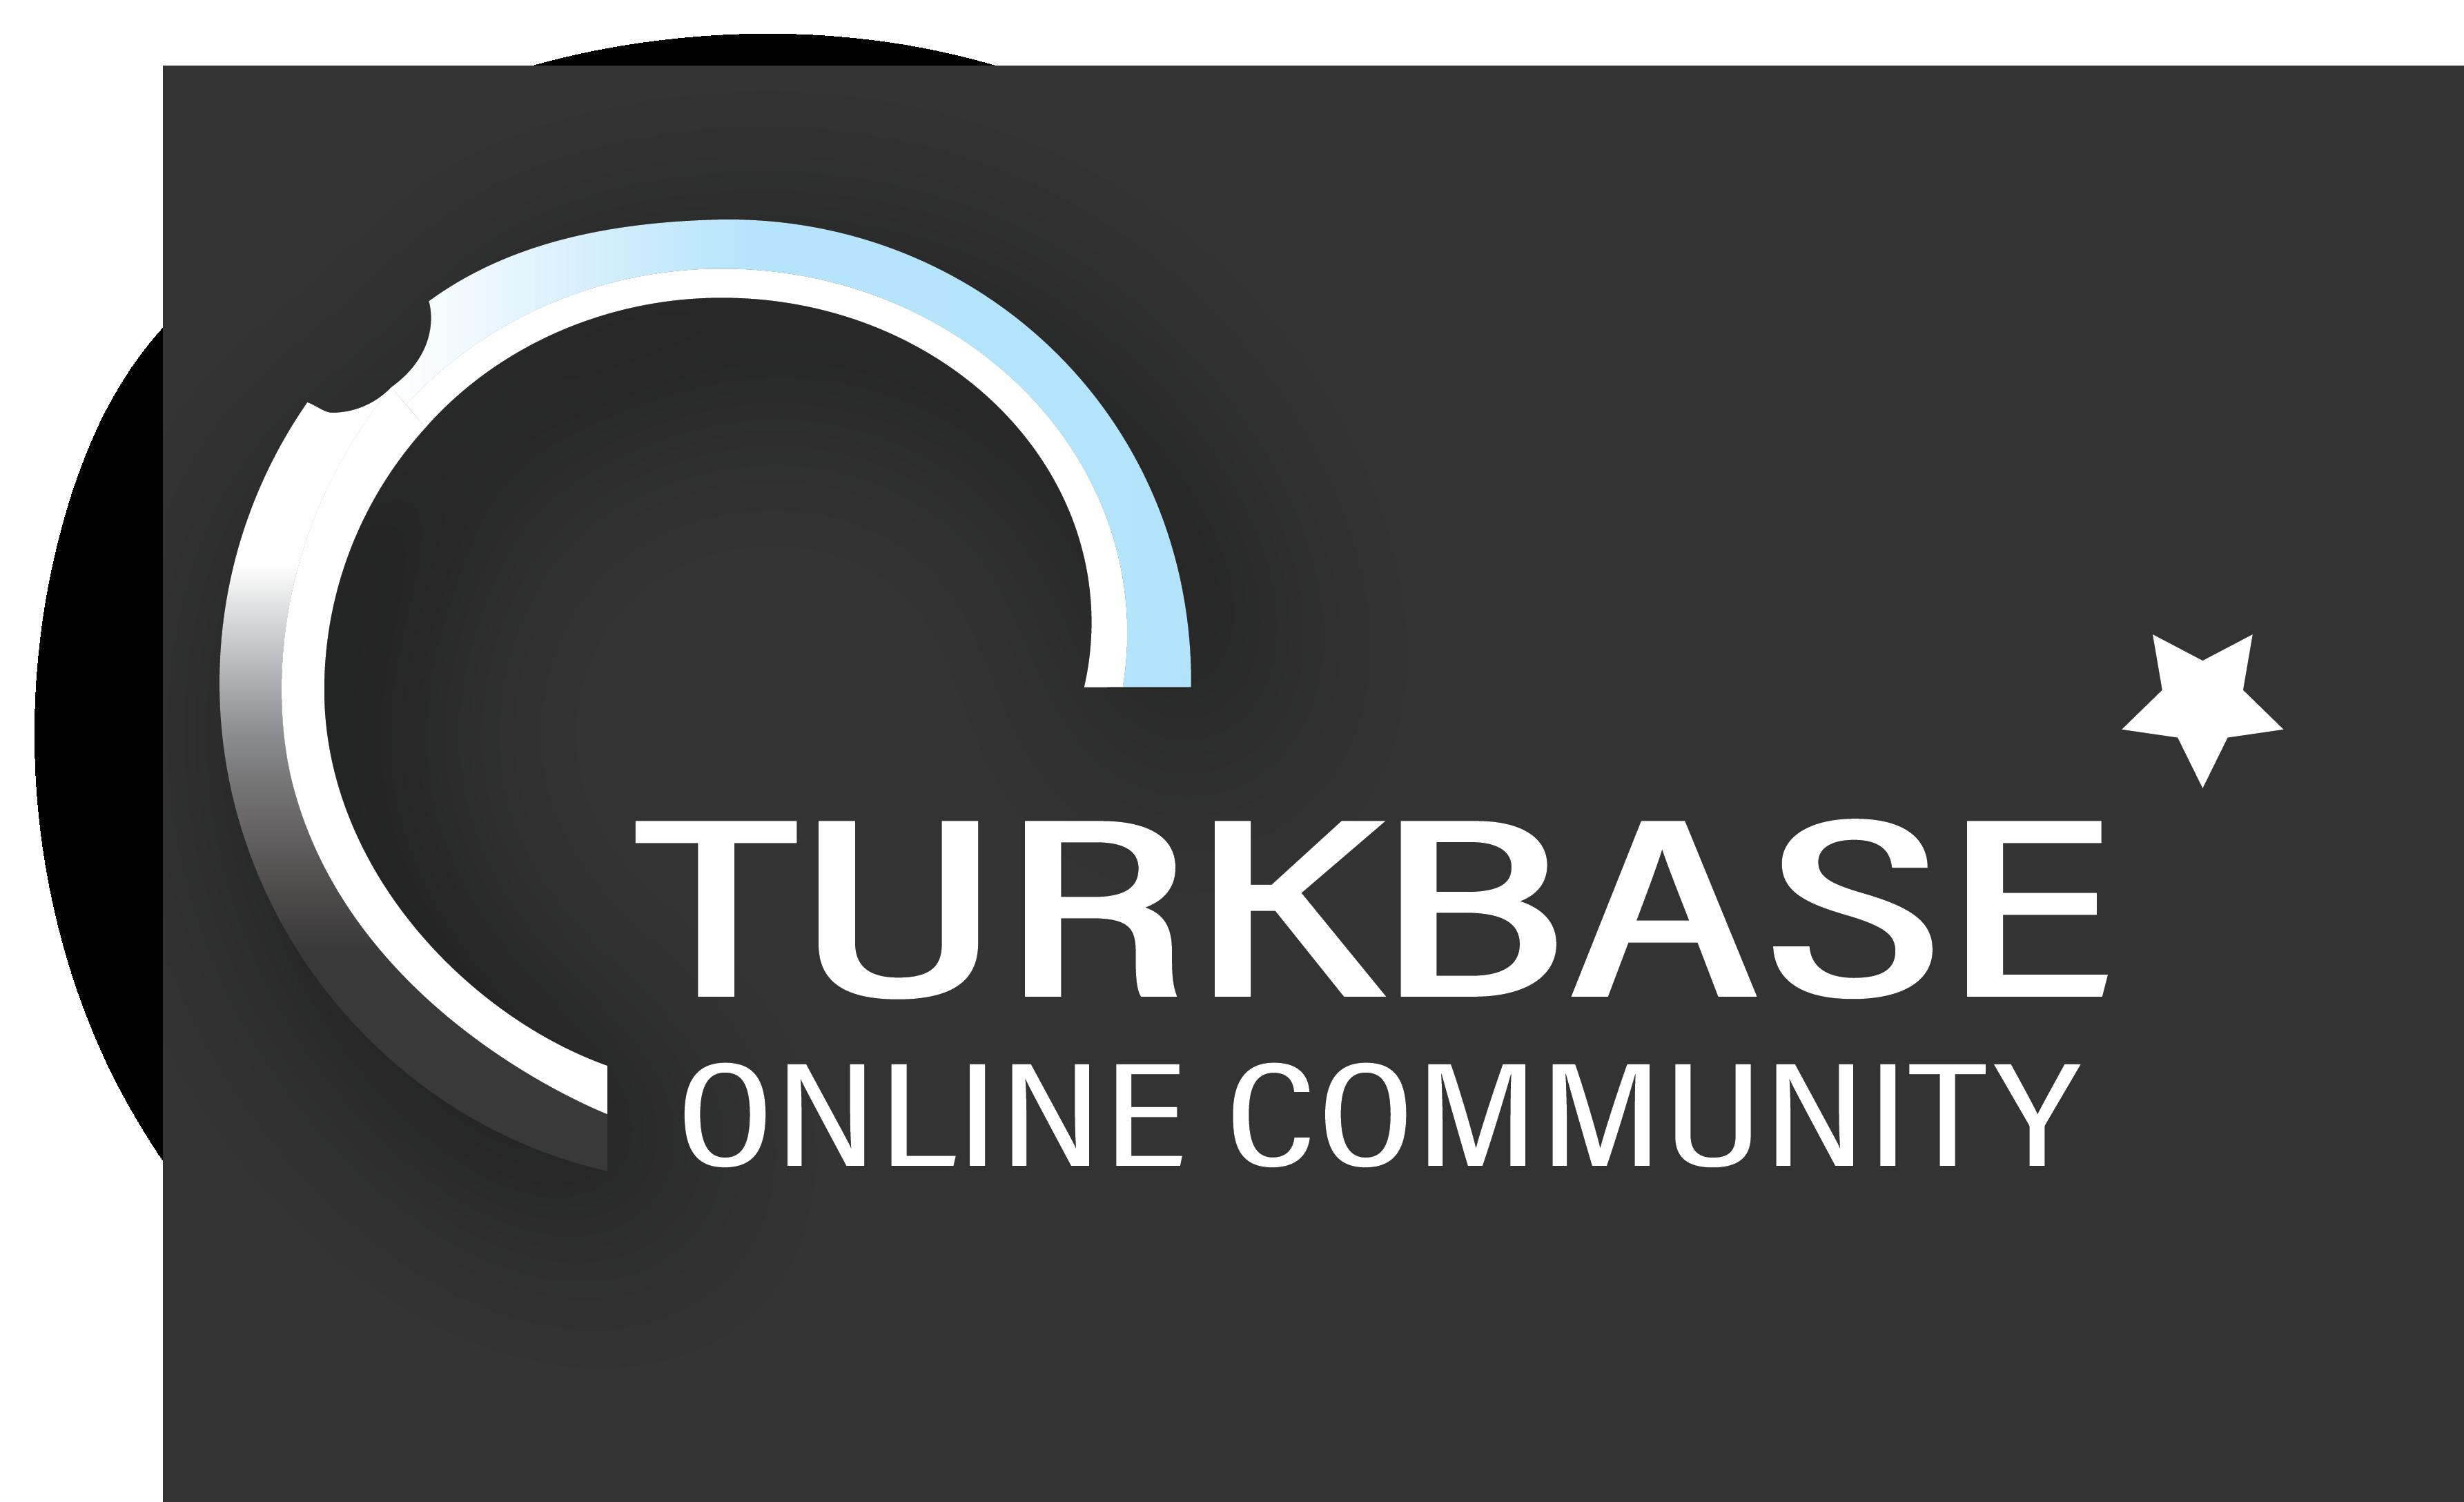 turkbase-logo